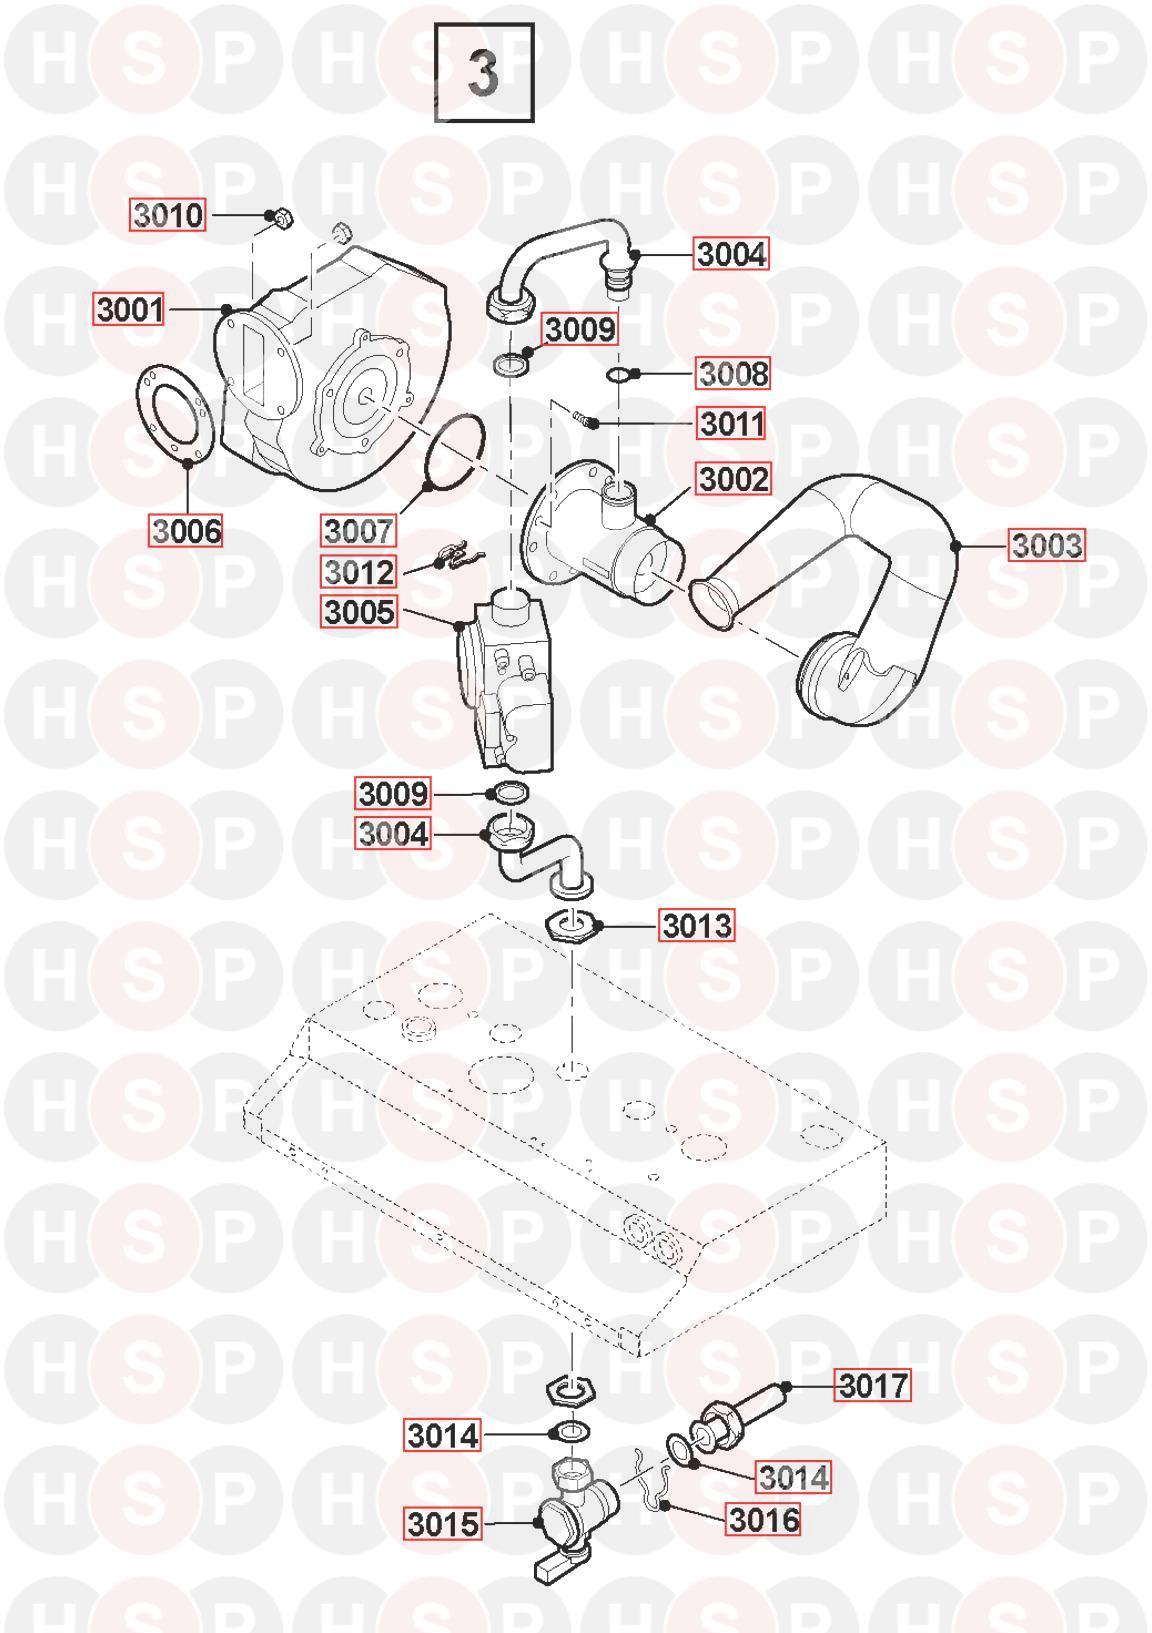 Remeha-Broag Avanta Plus System 30S (FAN ASSEMBLY) Diagram